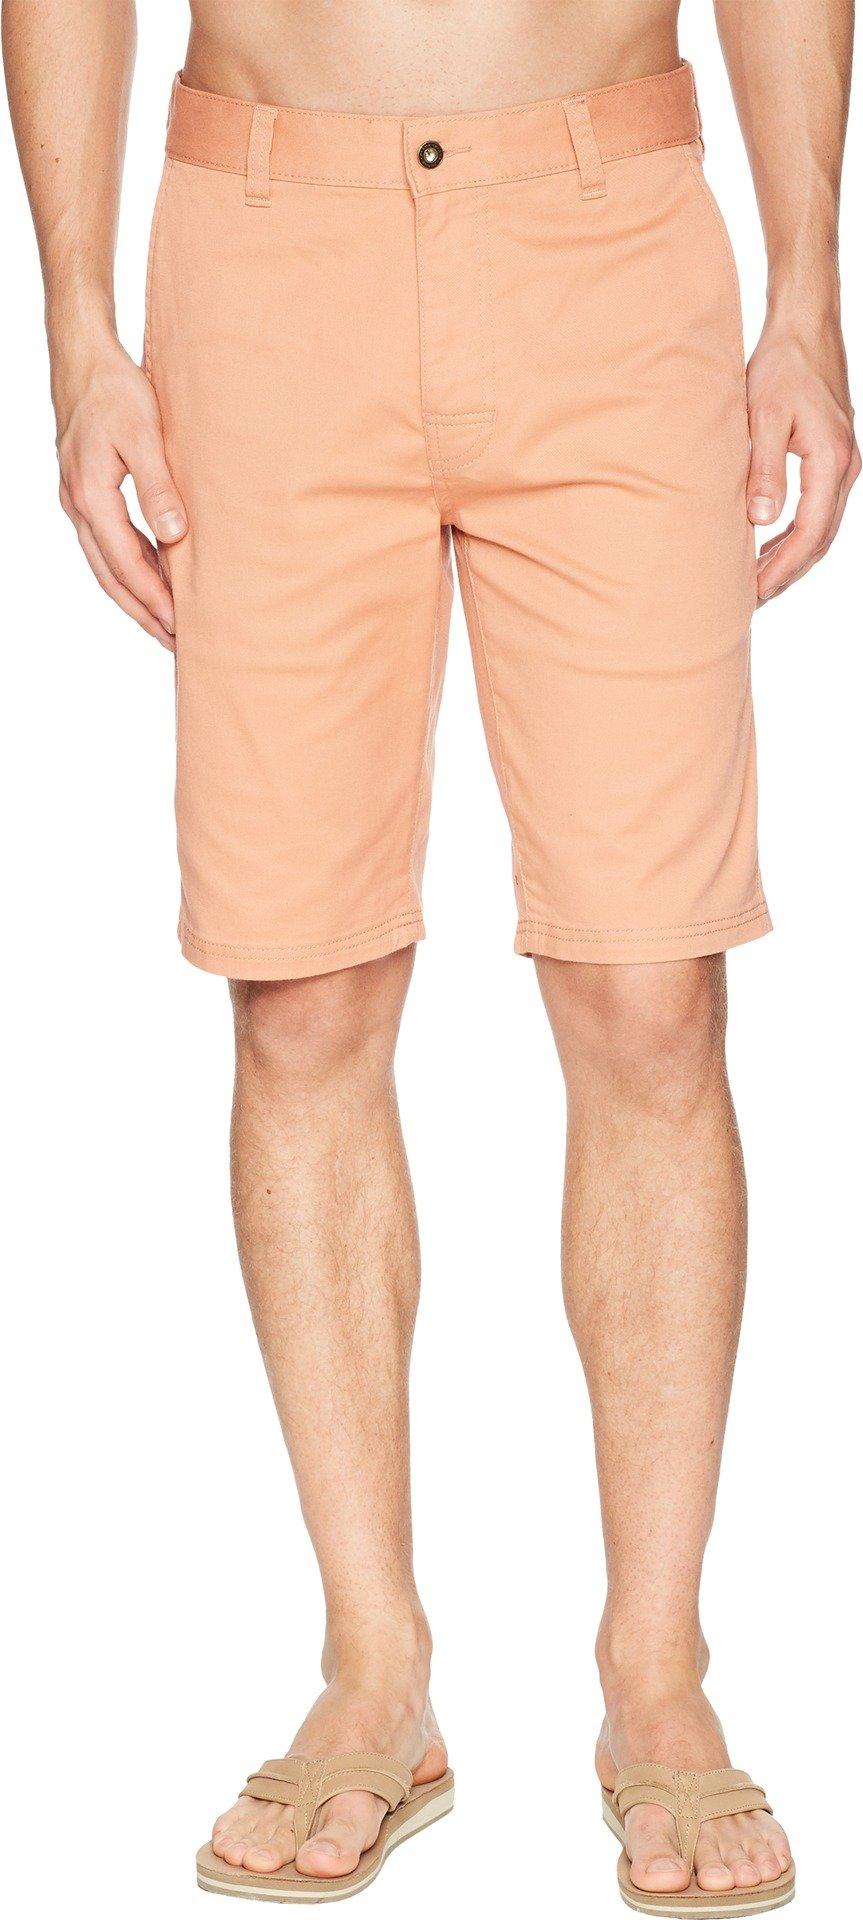 prAna Table Rock Chino Shorts, Sunset Pink, Size 32